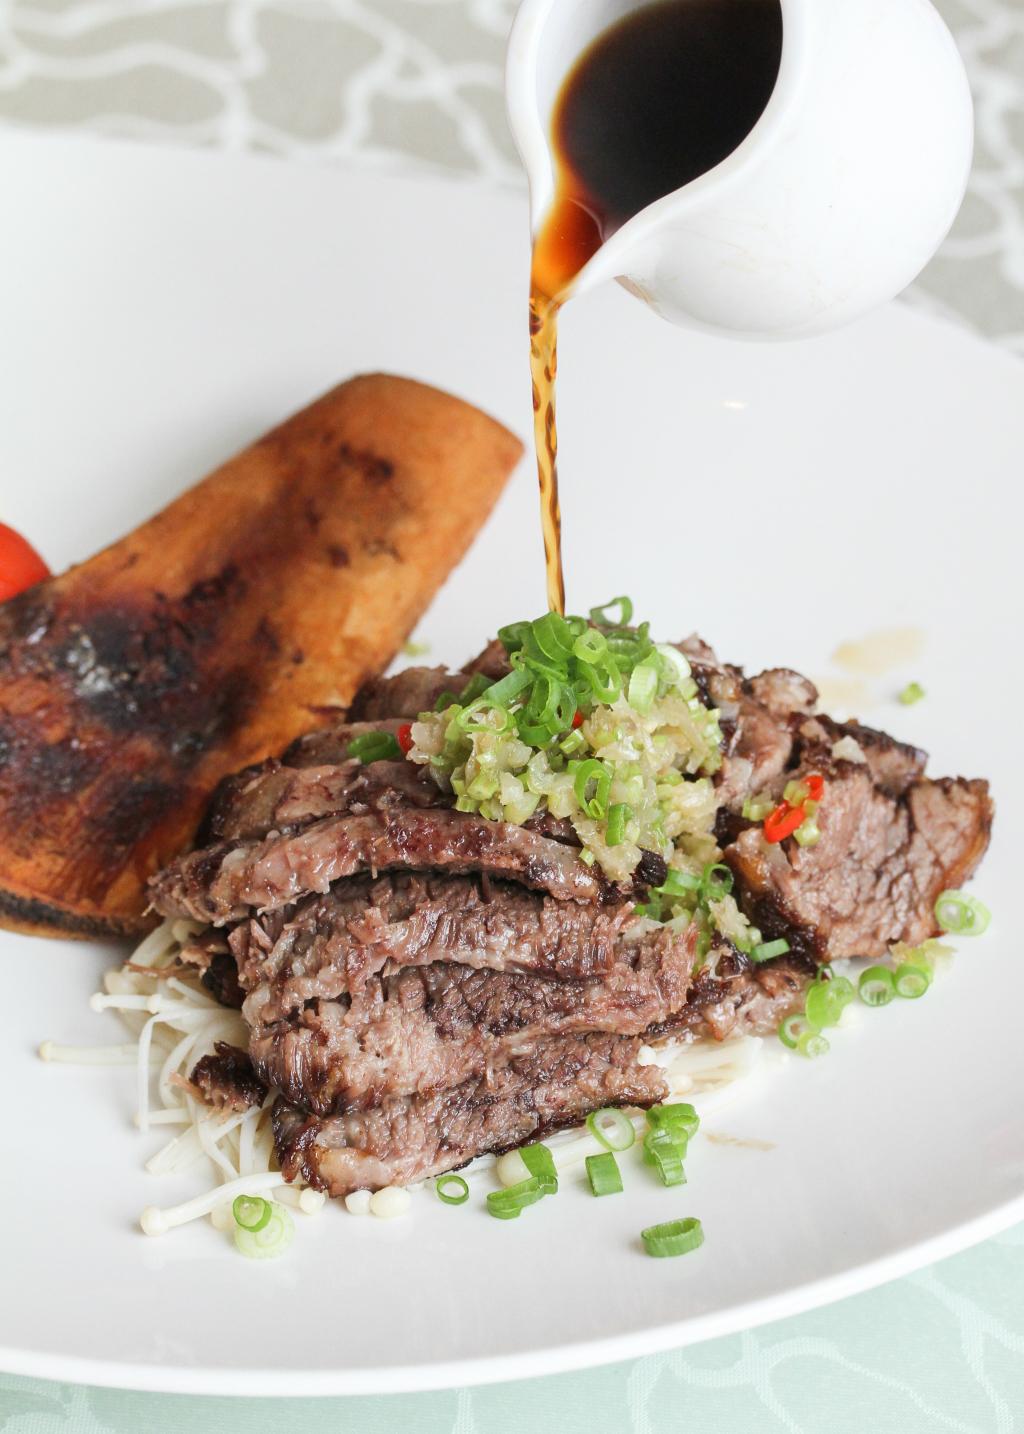 TungLok XiHe Peking Duck: saliva-inducing Pan-fried Beef Rib with Sichuan Pepper